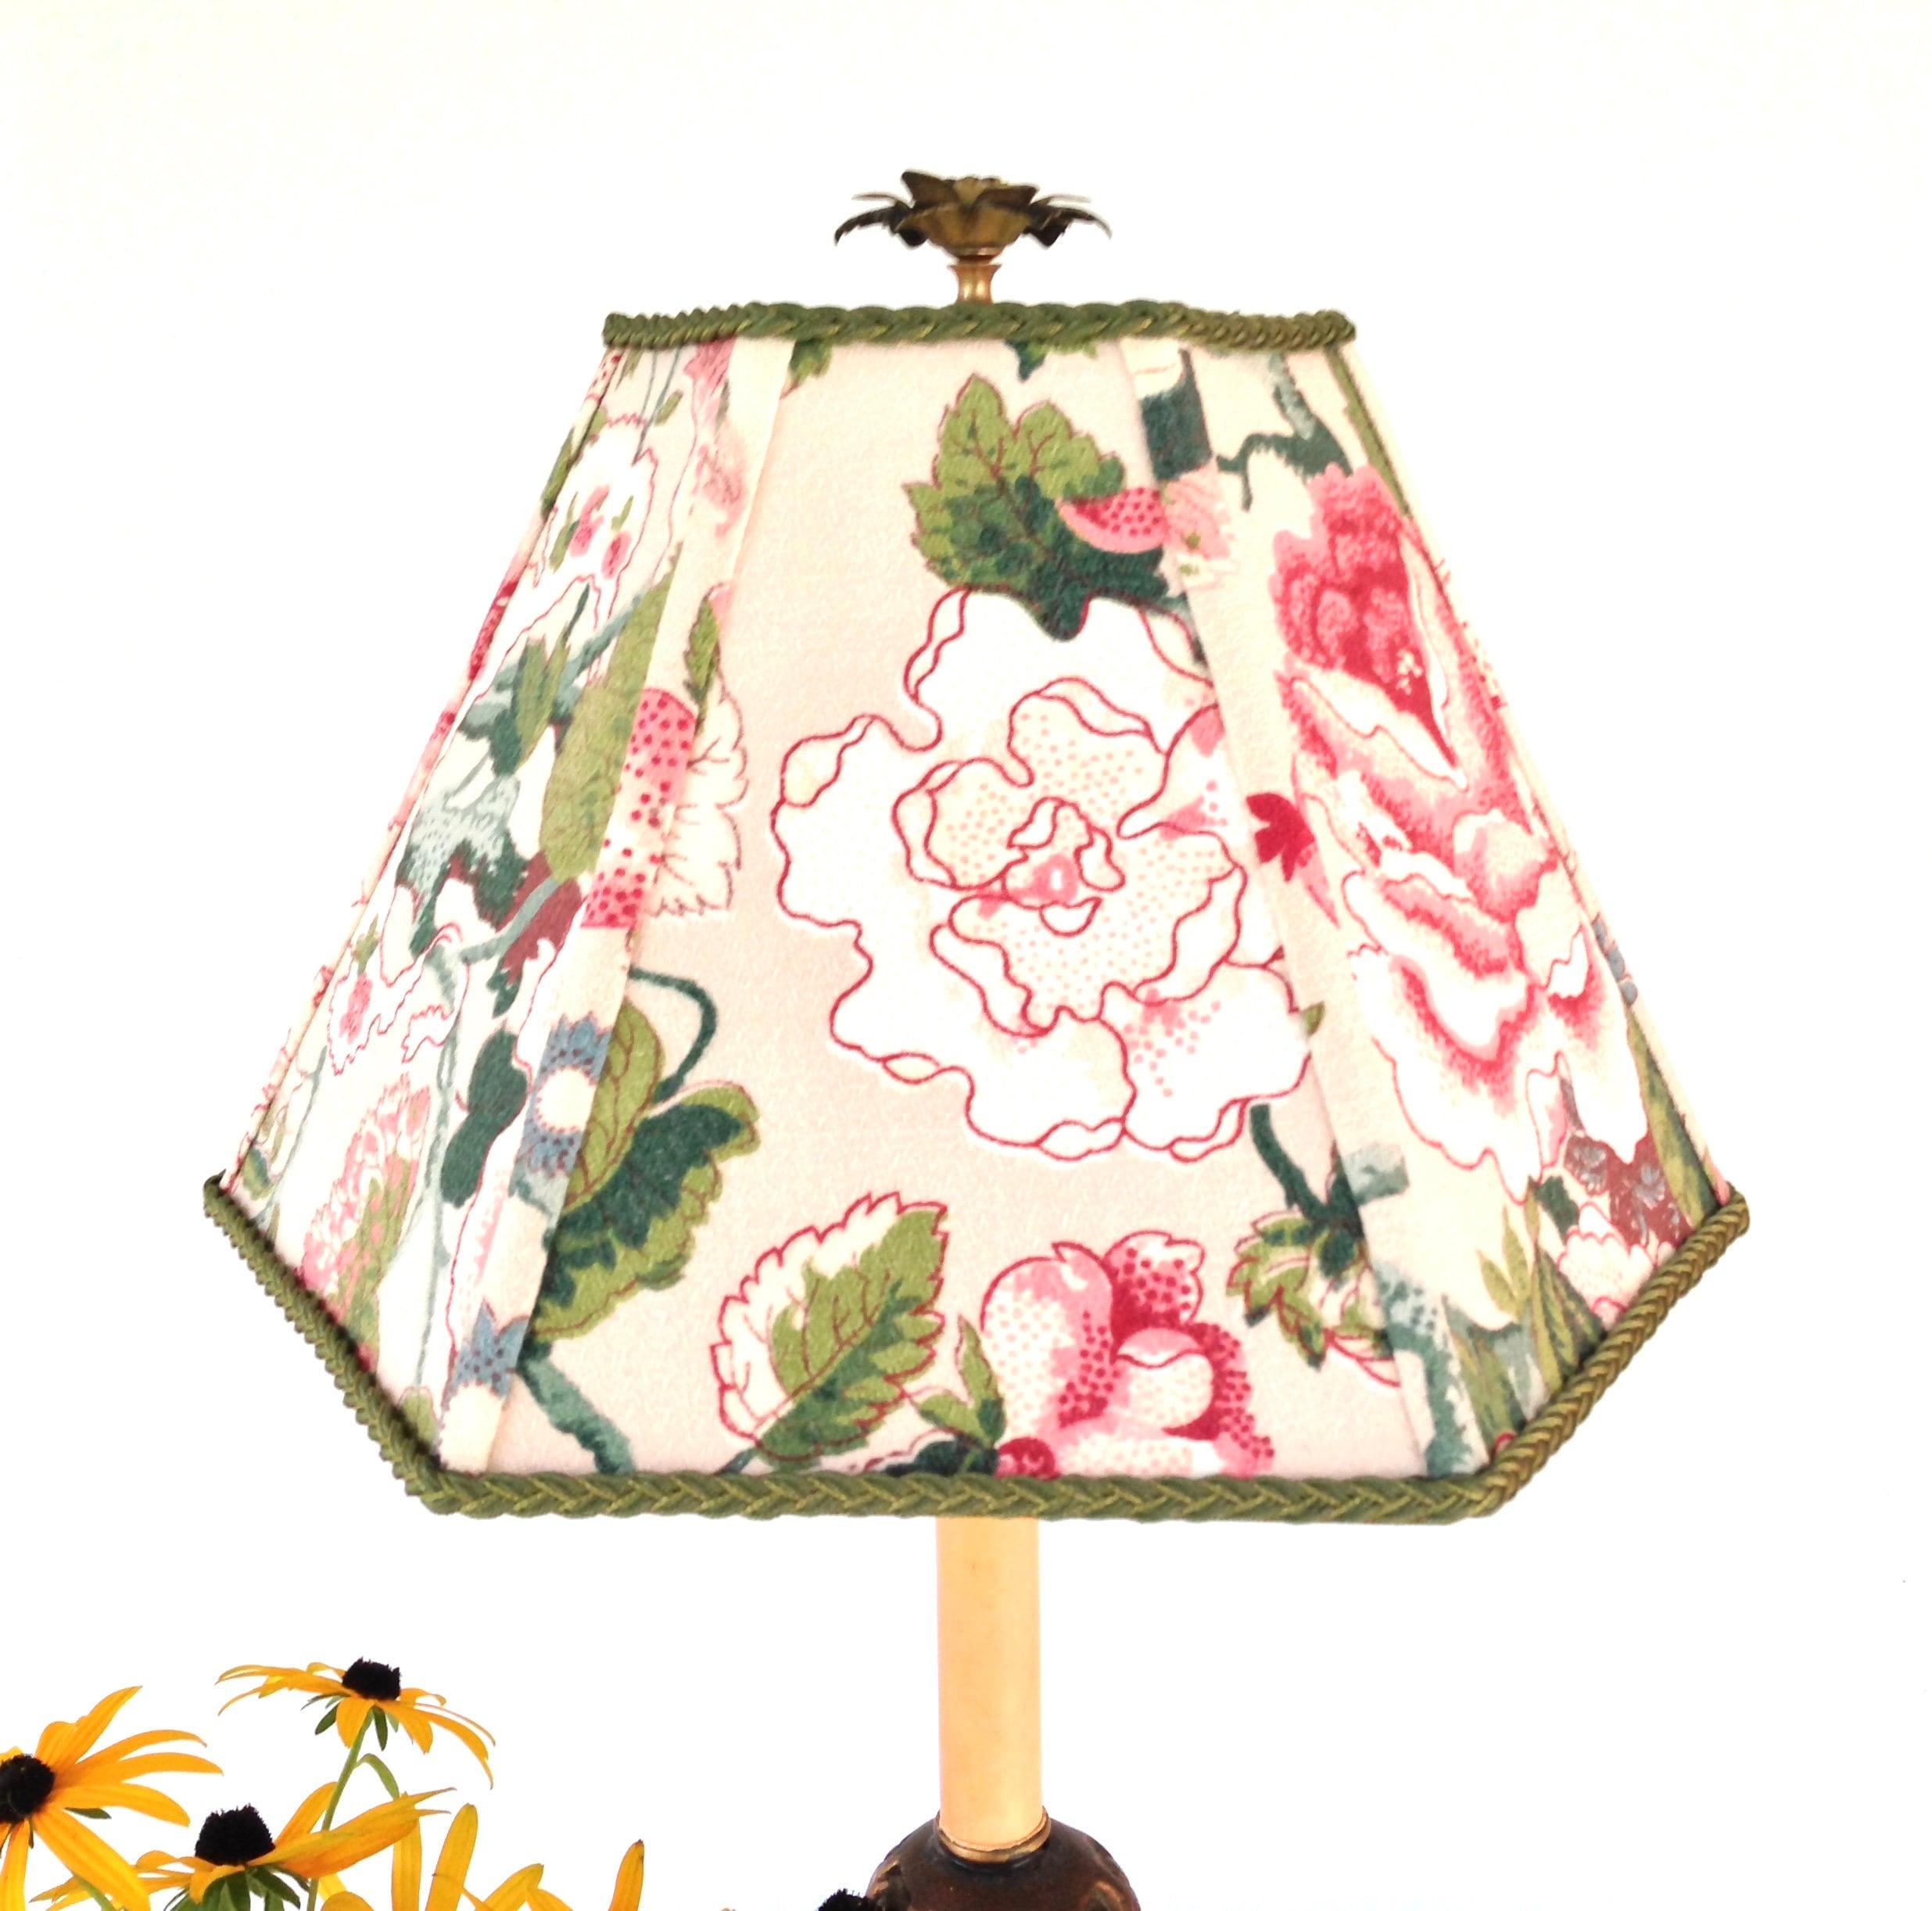 abat jour de tissu fleuri rose et vert lampe abat jour. Black Bedroom Furniture Sets. Home Design Ideas